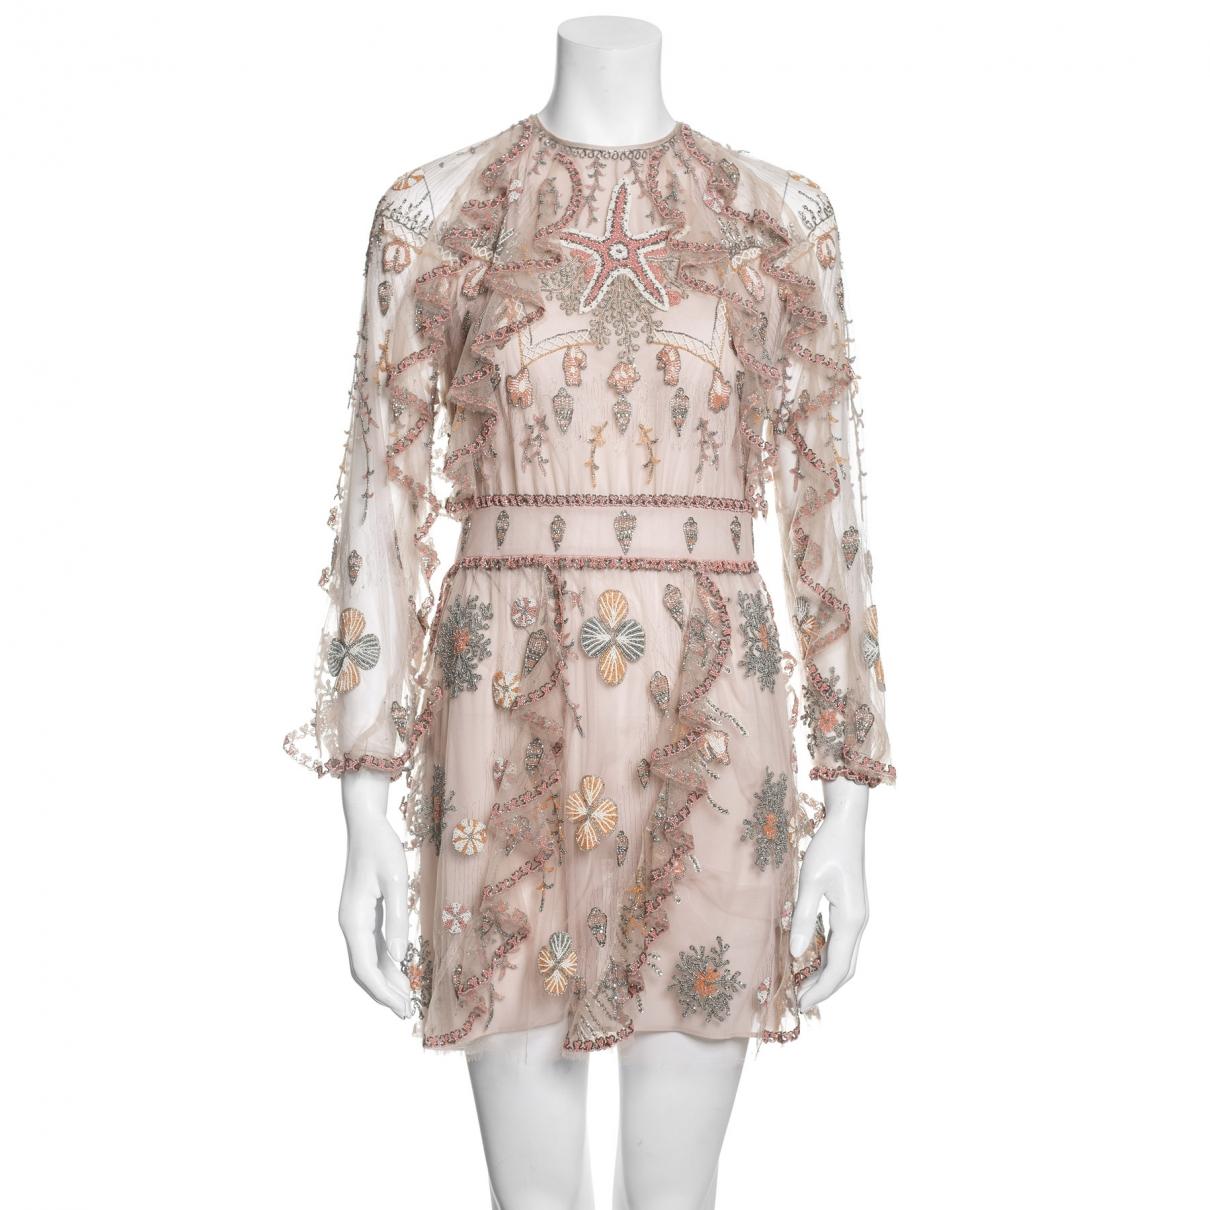 Valentino Garavani \N Pink dress for Women 38 FR